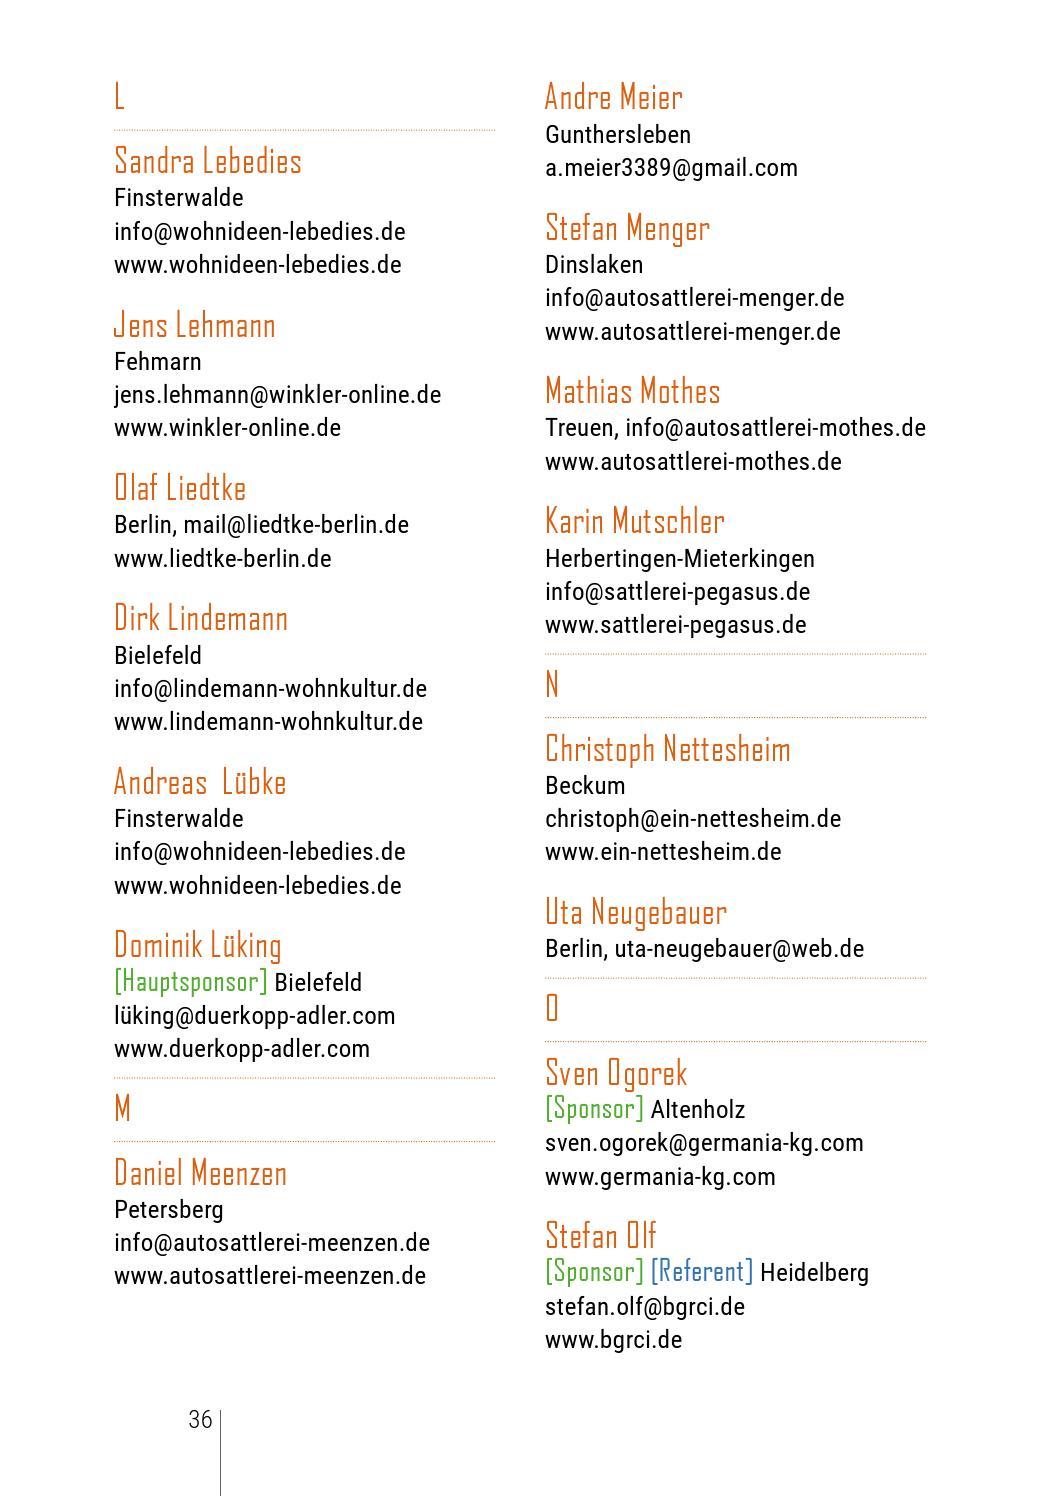 Wohnideen Lebedies tagungsheft jungmeistertagung aurich 2016 by jungmeisterkreis